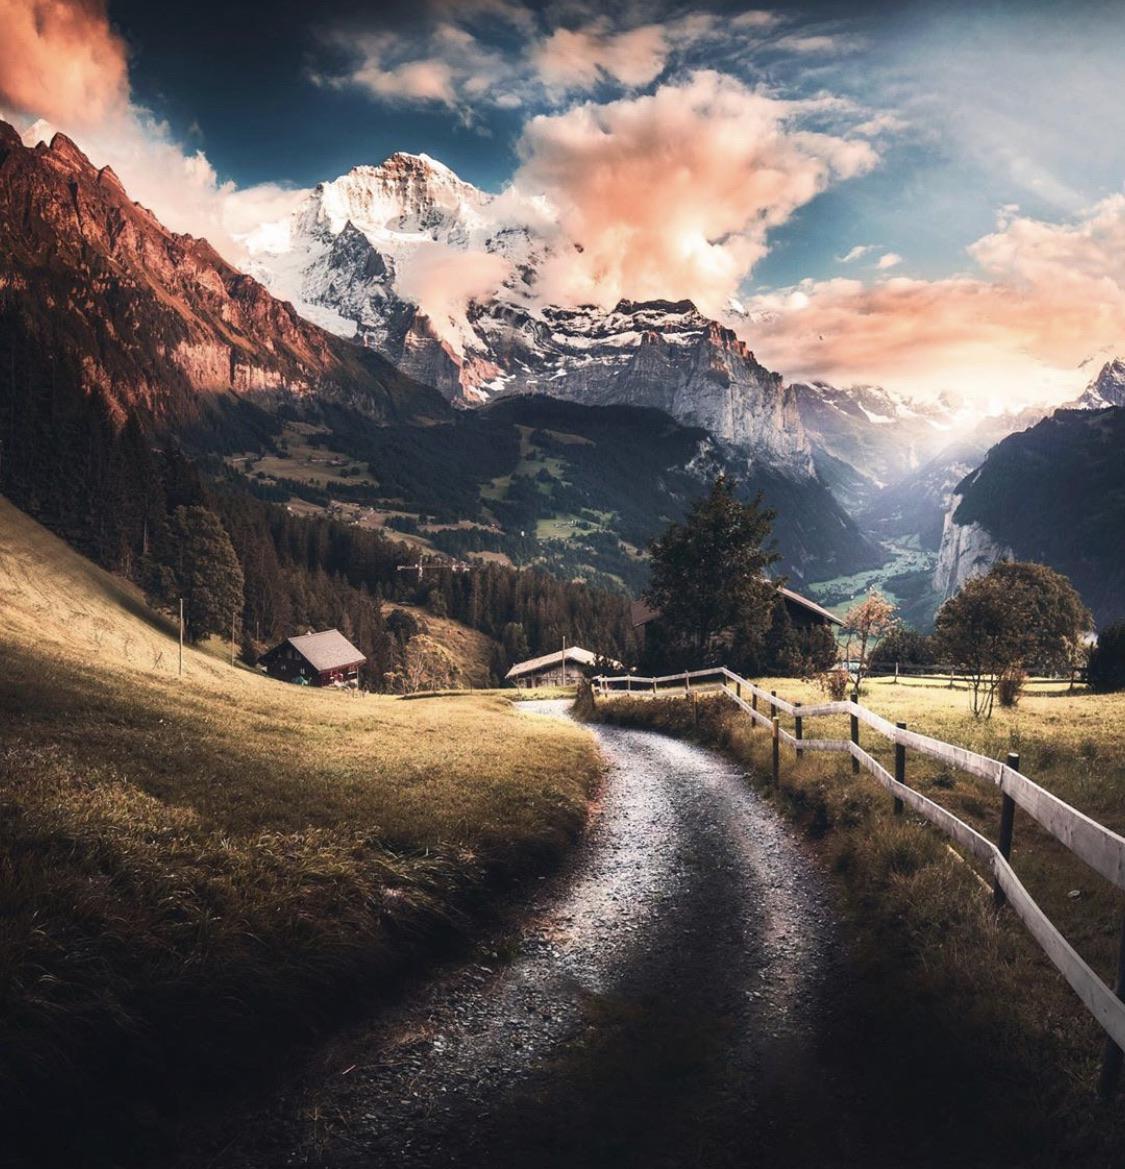 The beauty of Switzerland.